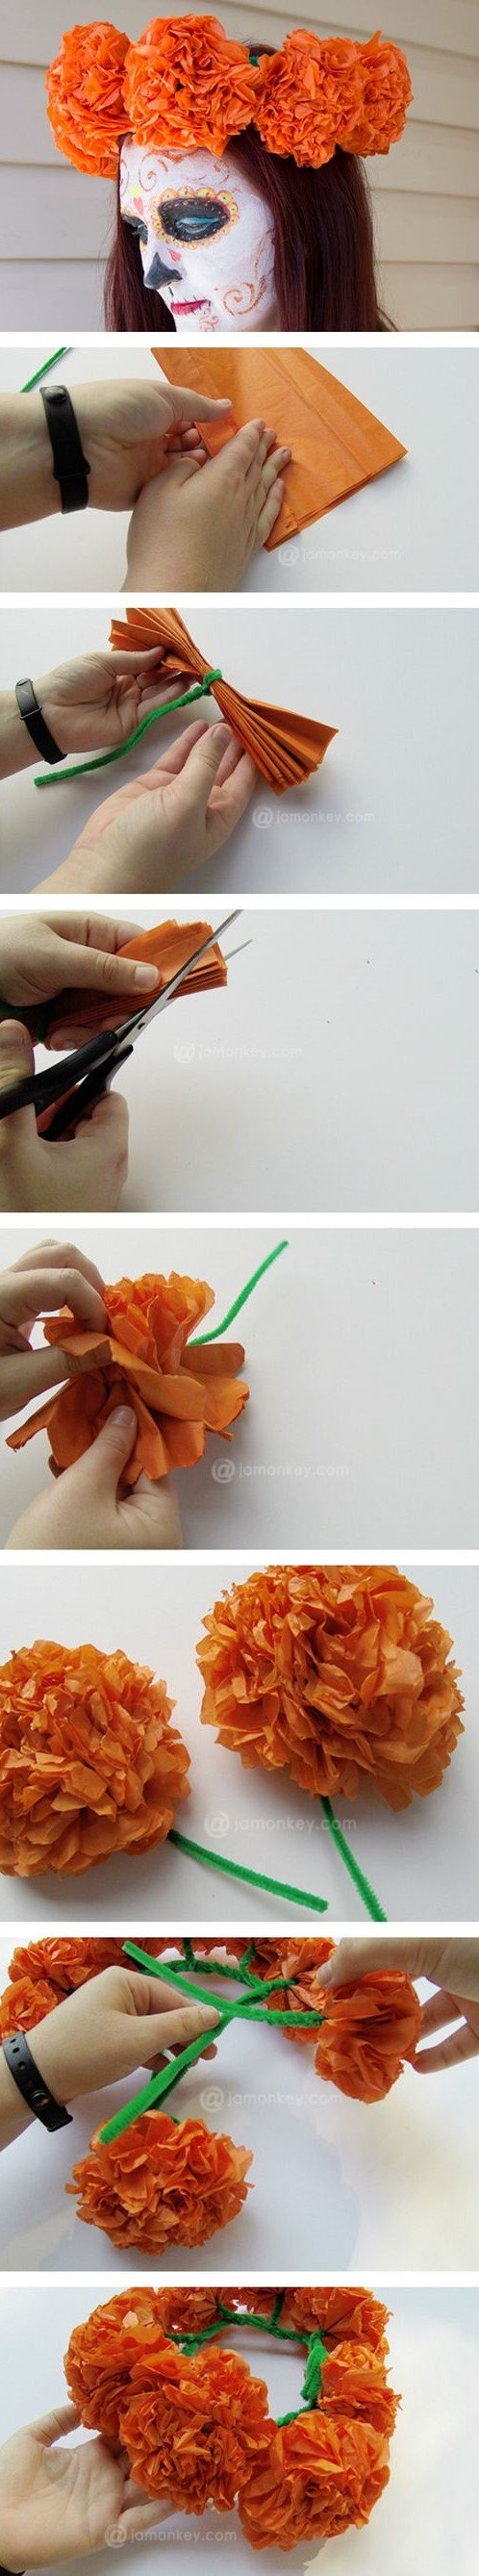 corona de cempasúchil de papel